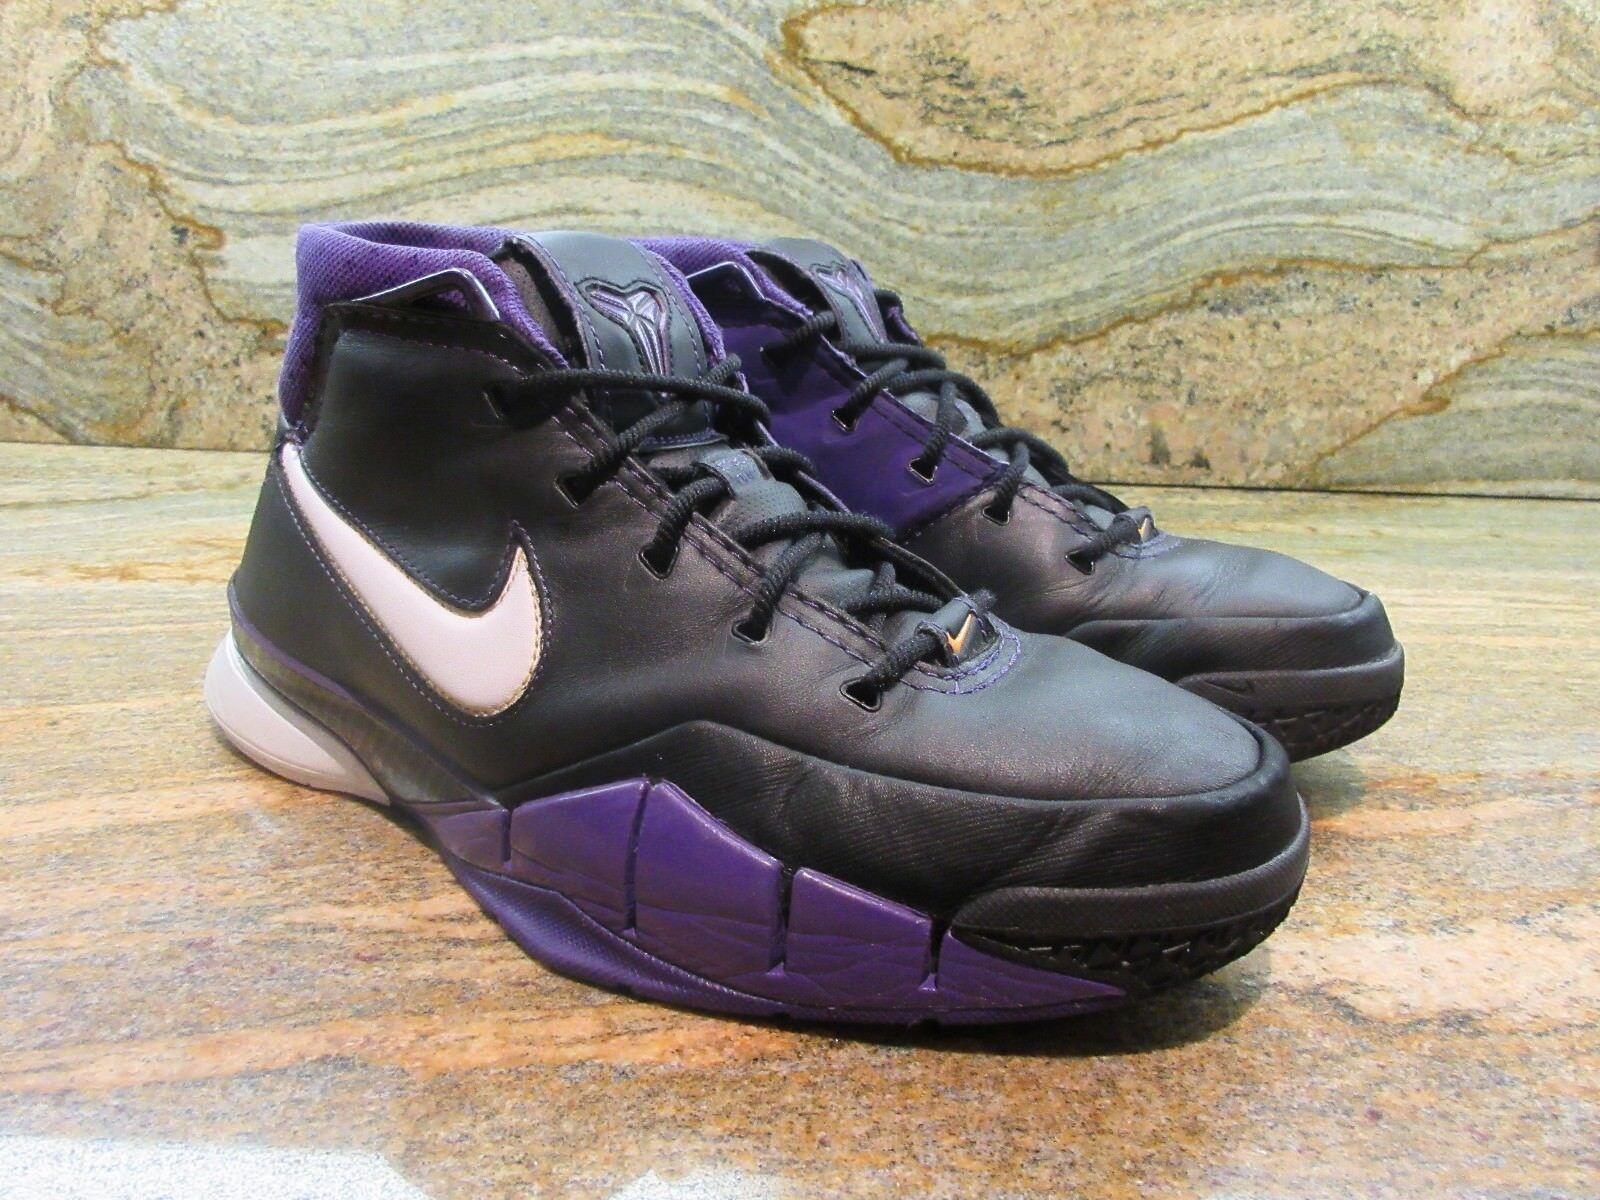 2006 Nike Zoom Kobe 1 OG SZ 9.5 Black Out LA Lakers Bryant Predro 313143-014